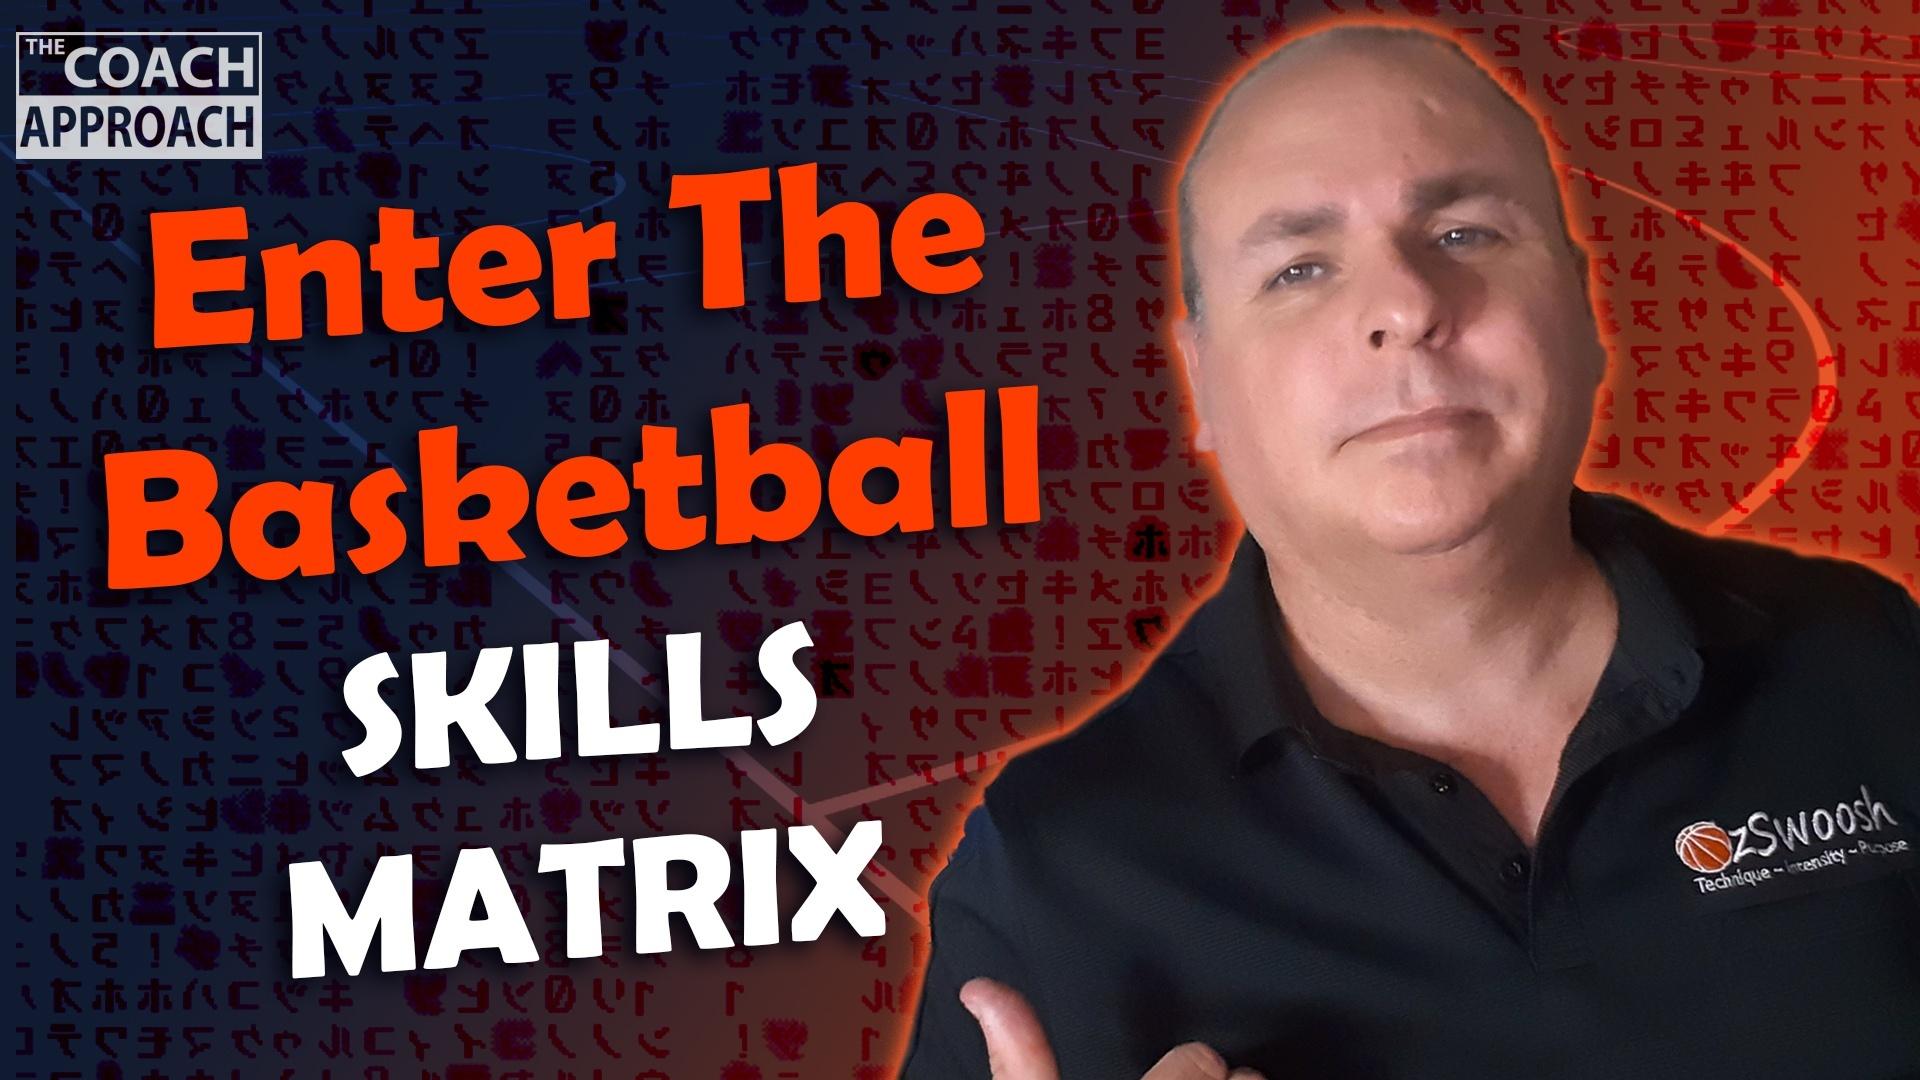 Basketball Skills Matrix - Coaching for beginners